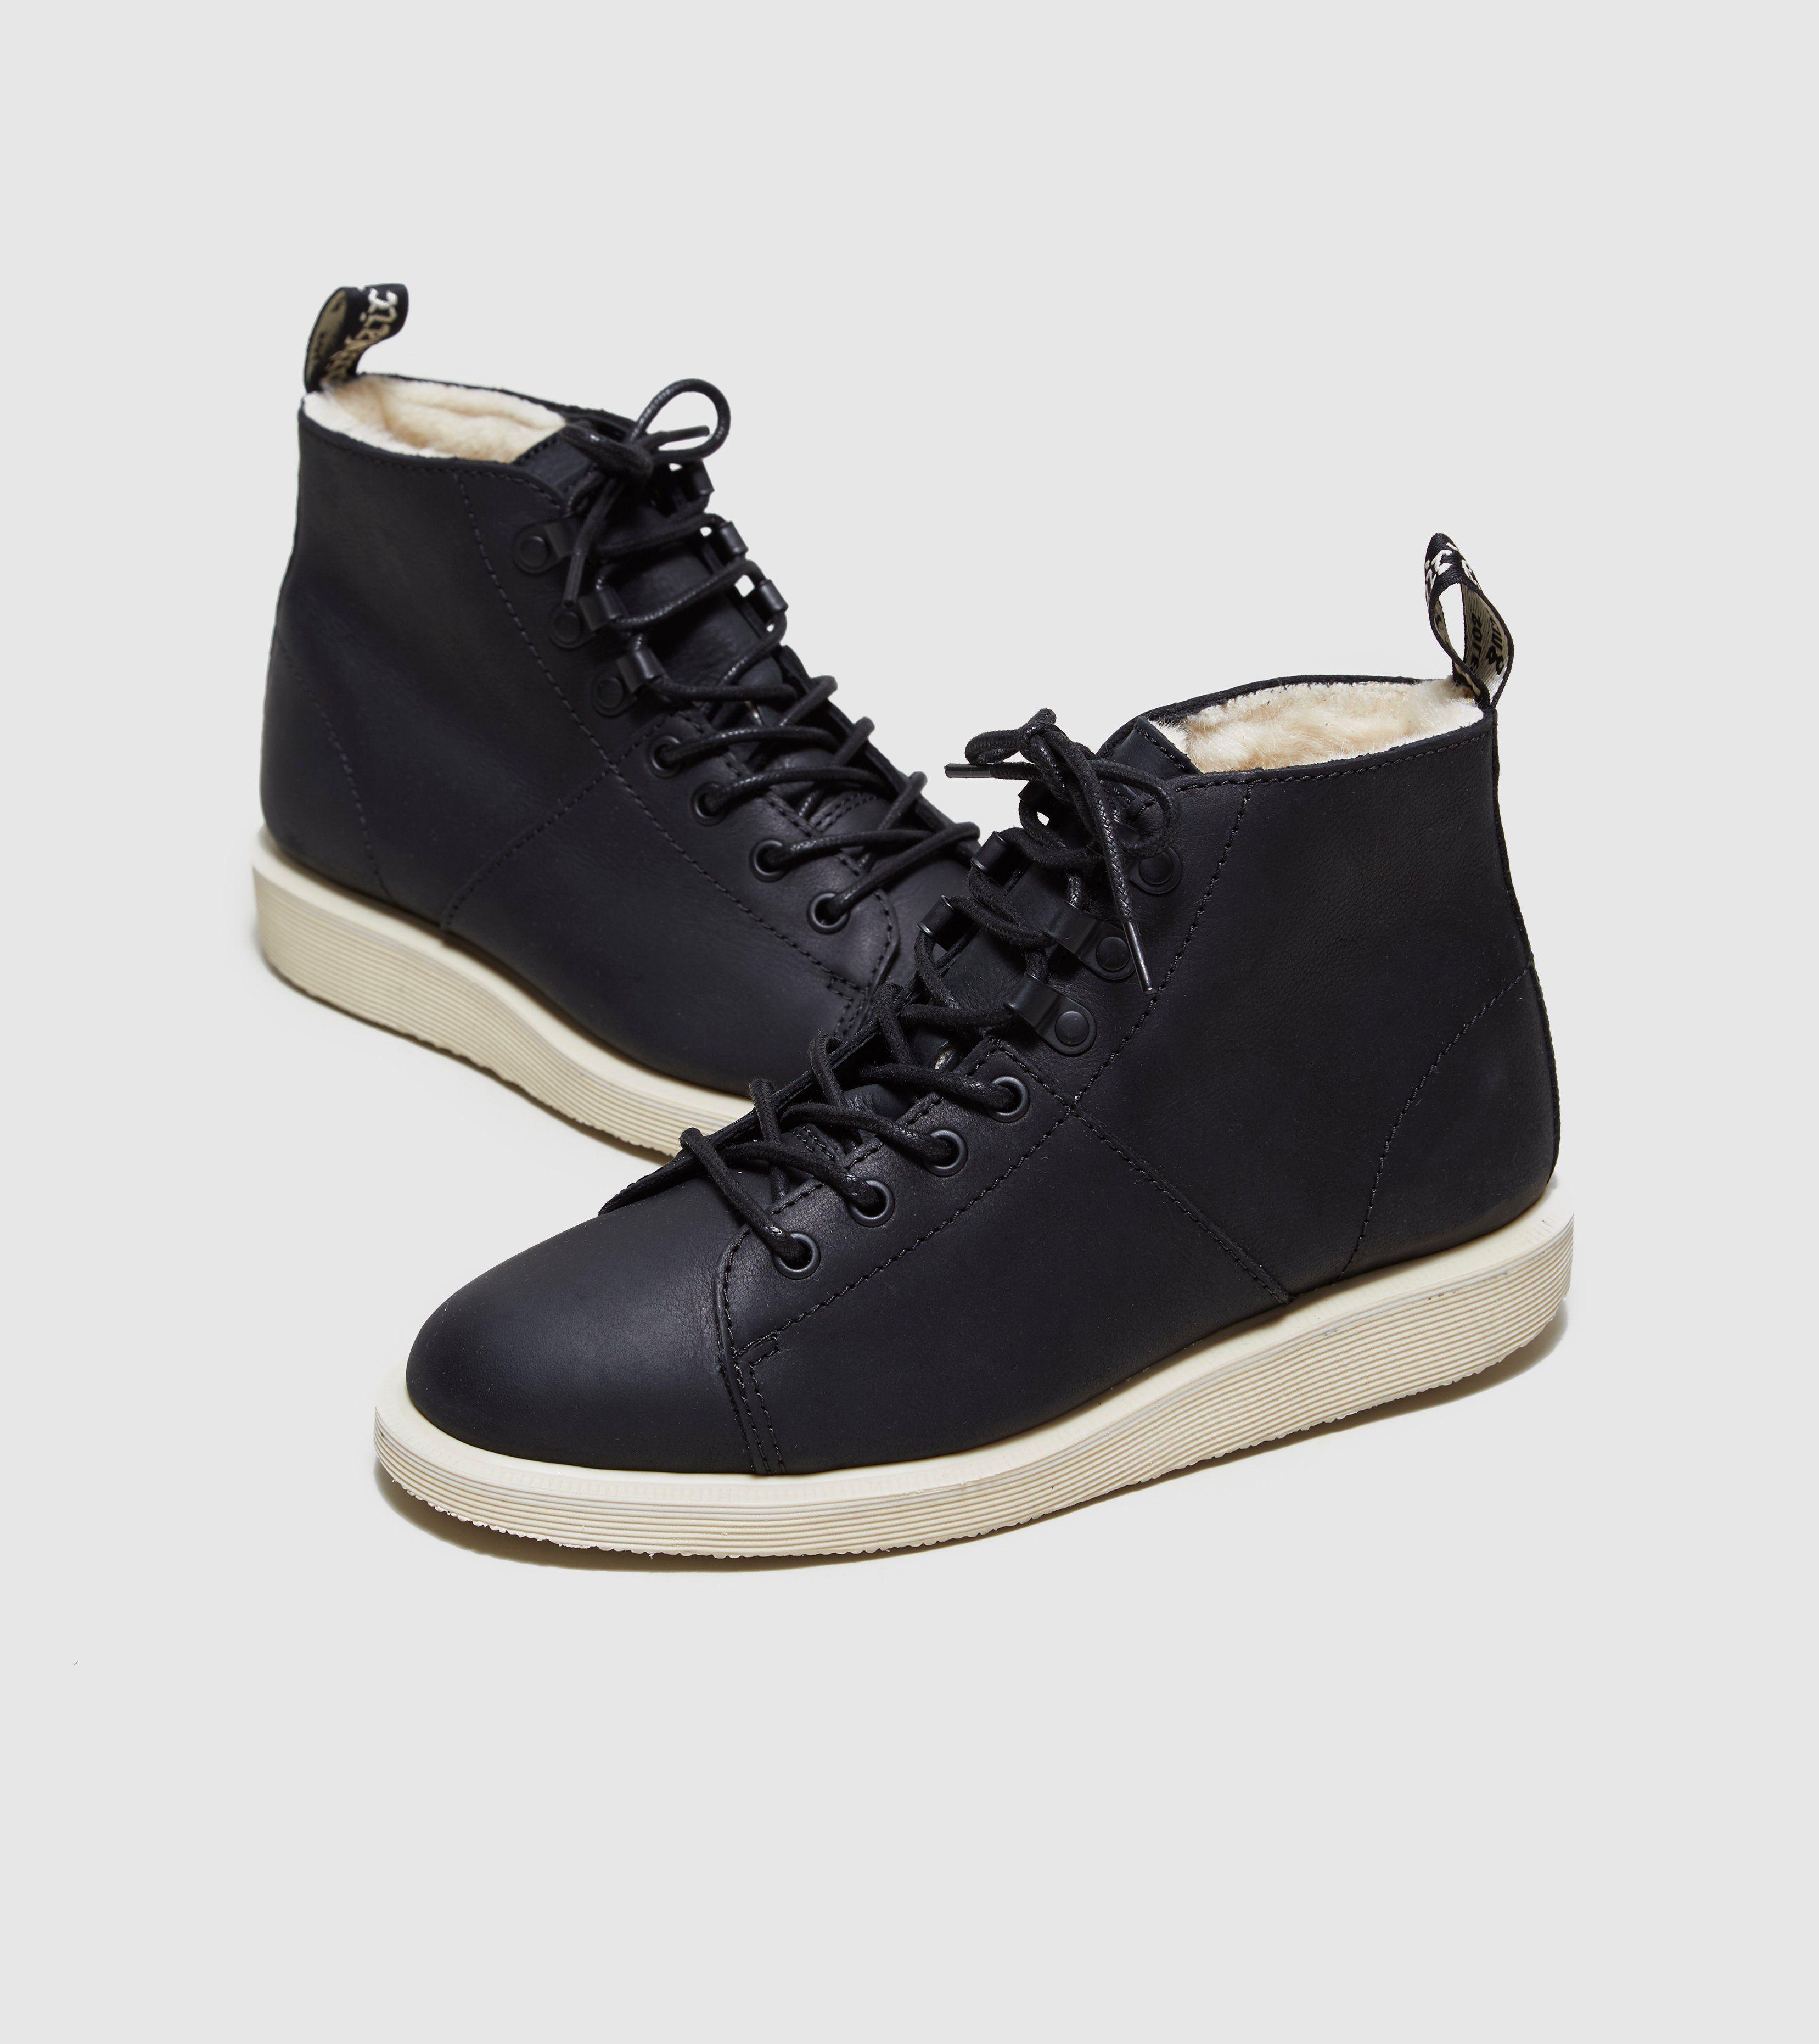 Dr. Martens Fur Lined Les Boot